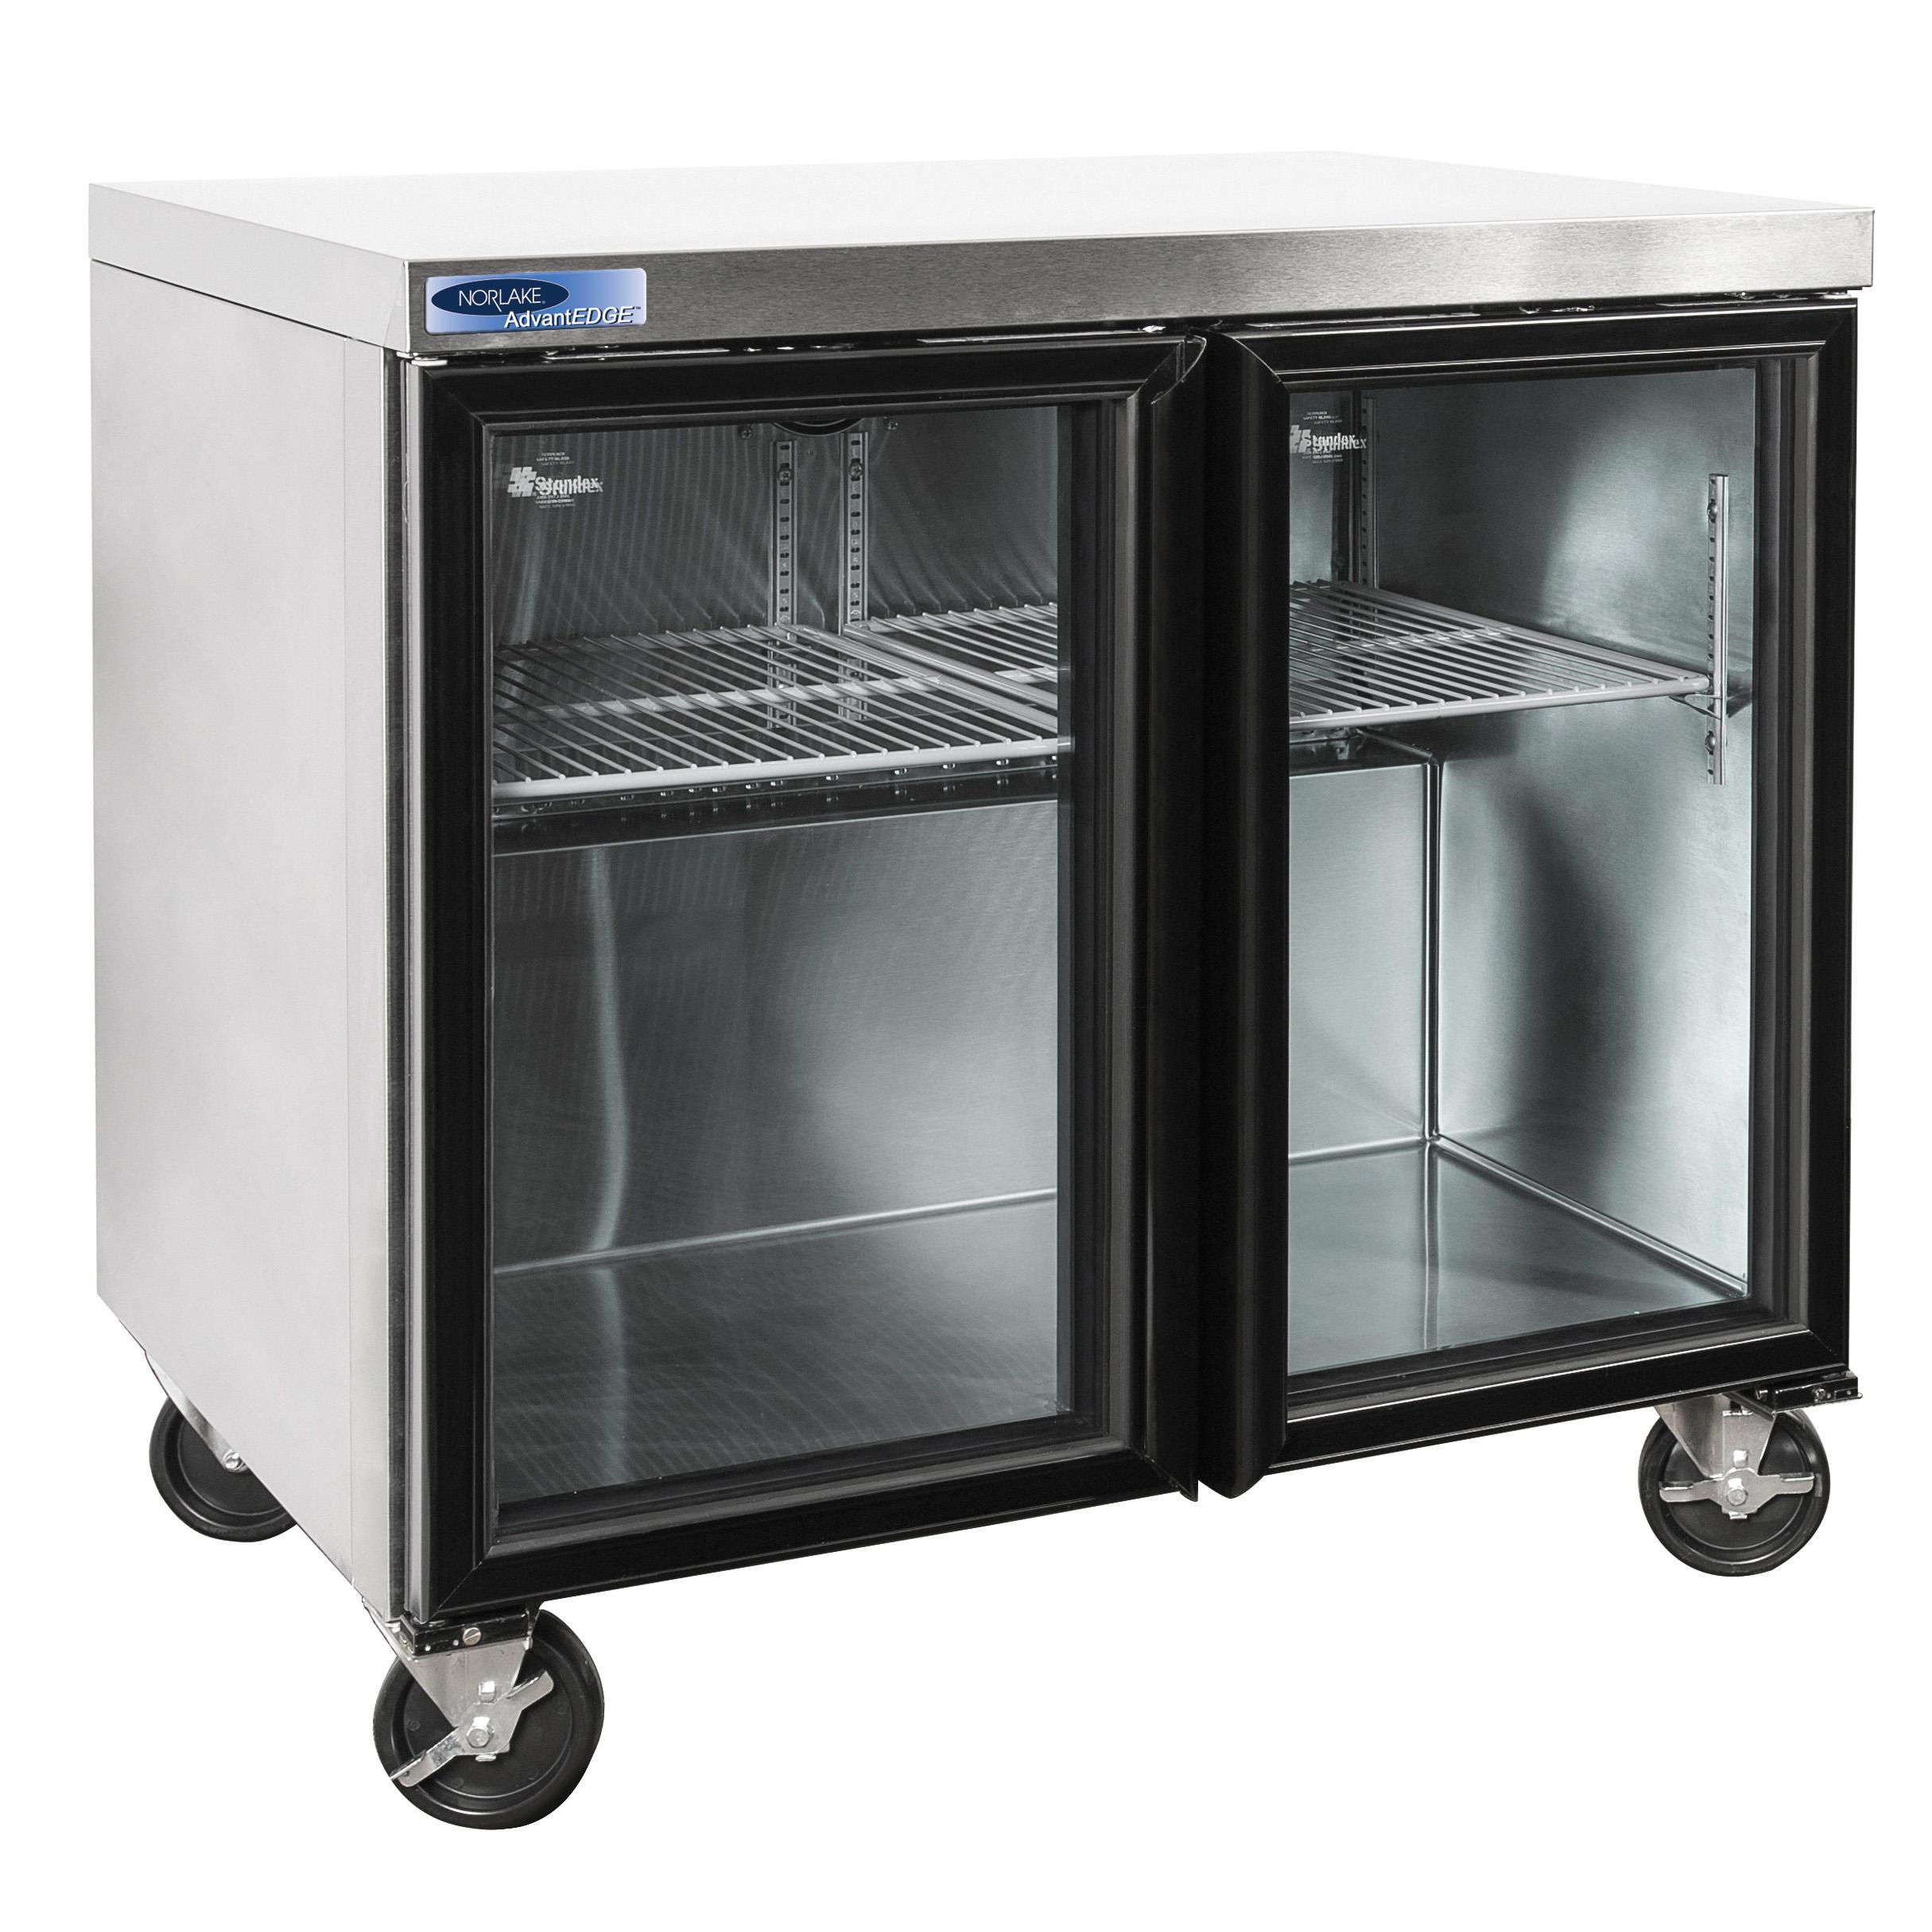 Nor-Lake NLURG36A-015 refrigerator, undercounter, reach-in